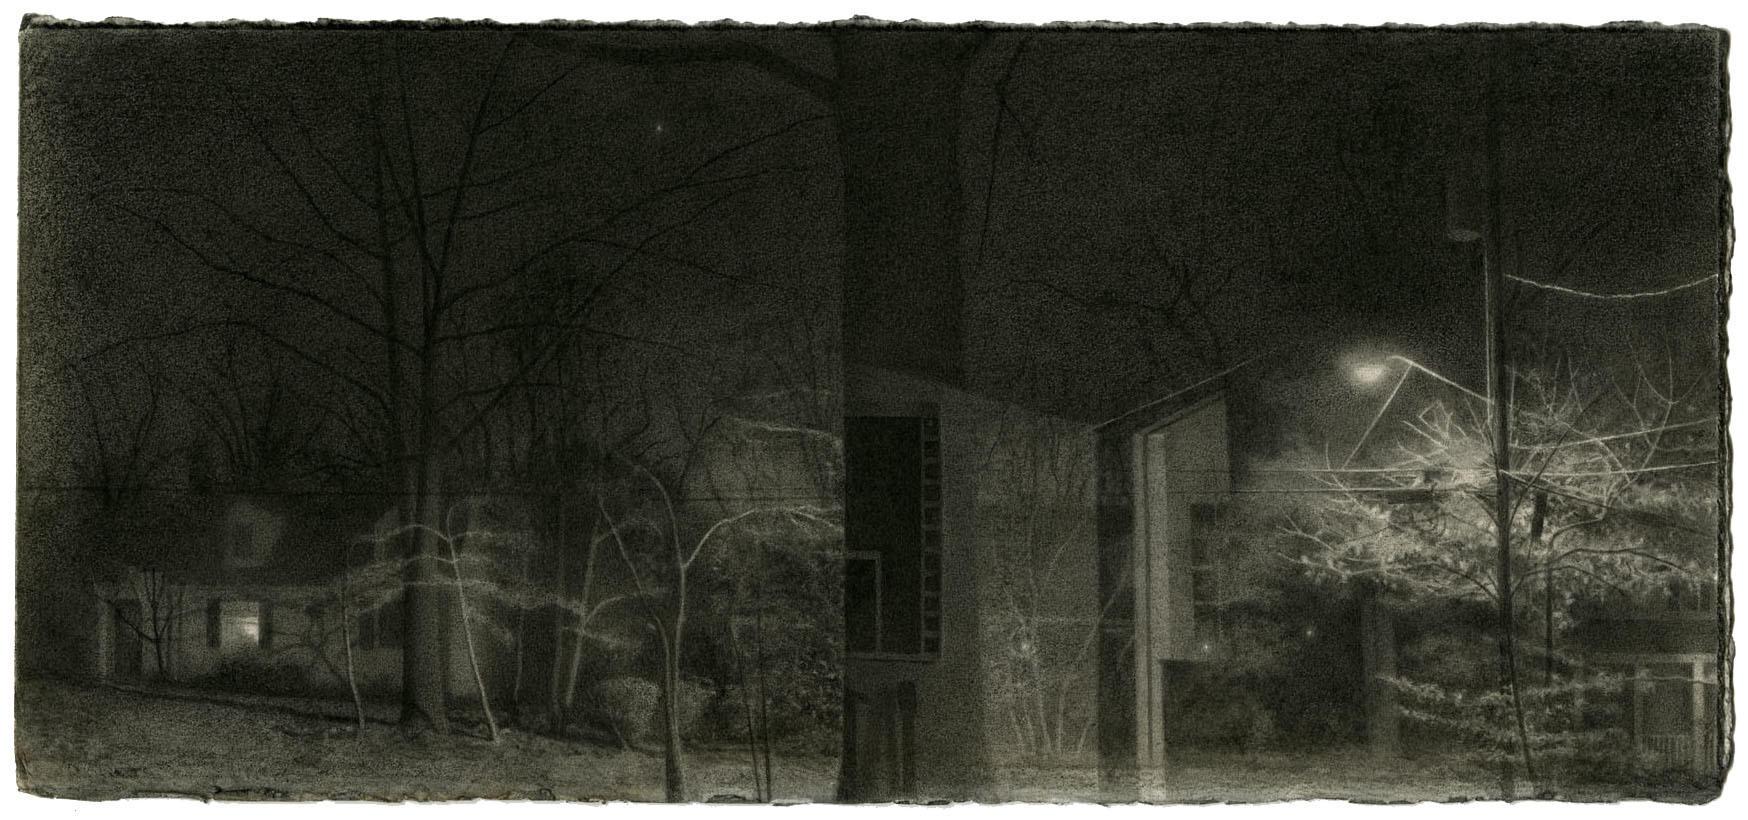 Landscape in Conte Crayon and Graphite image